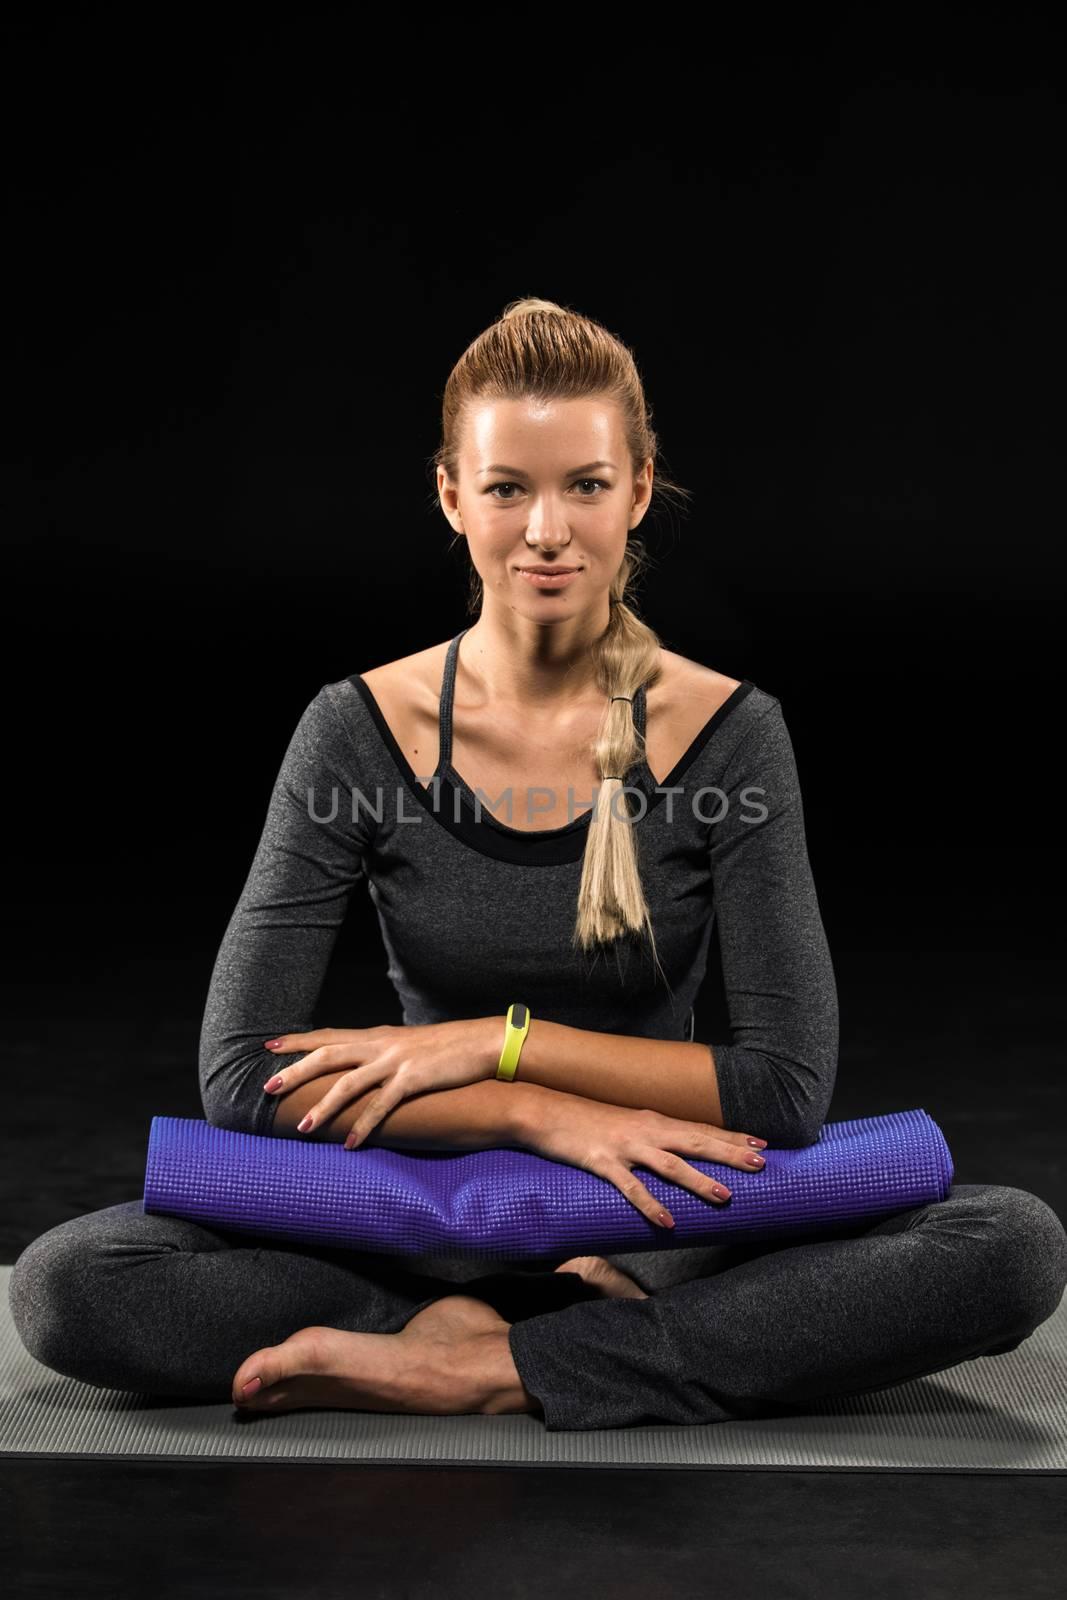 Sportswoman exercising yoga and holding yoga mat